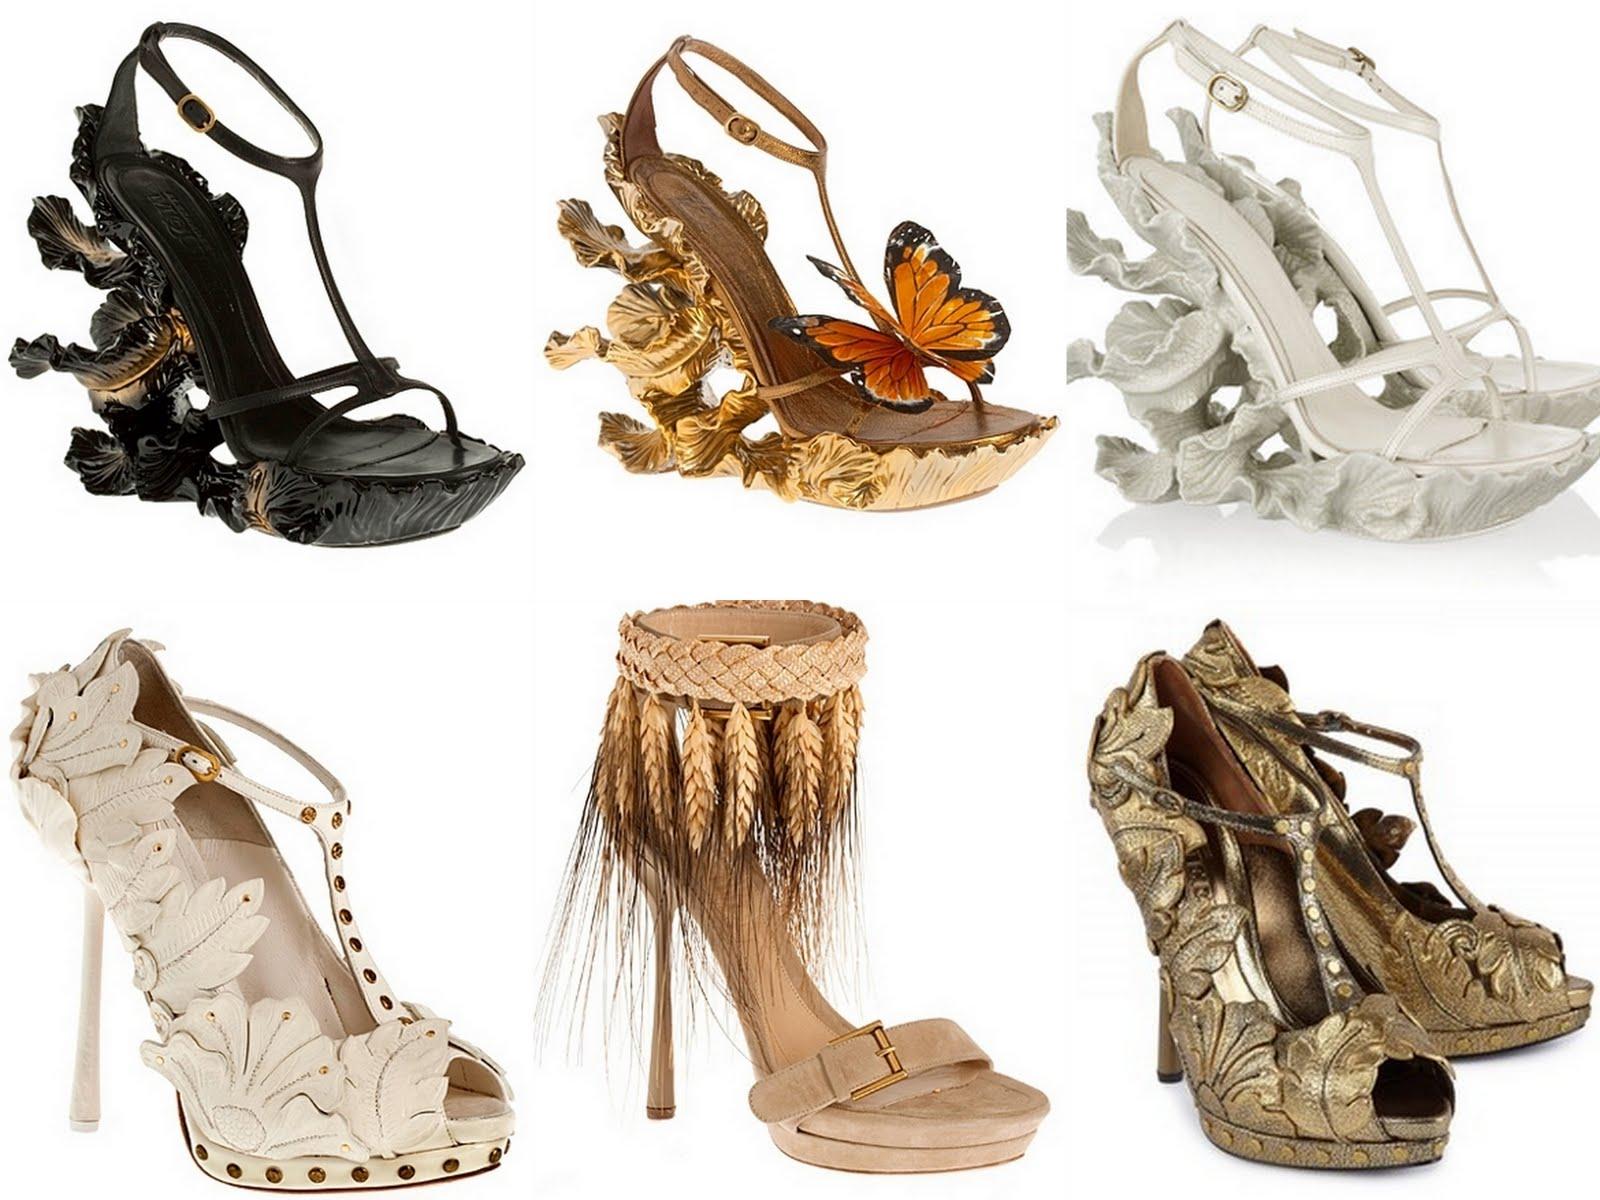 Fantasy Boots Men Shoes Illustration